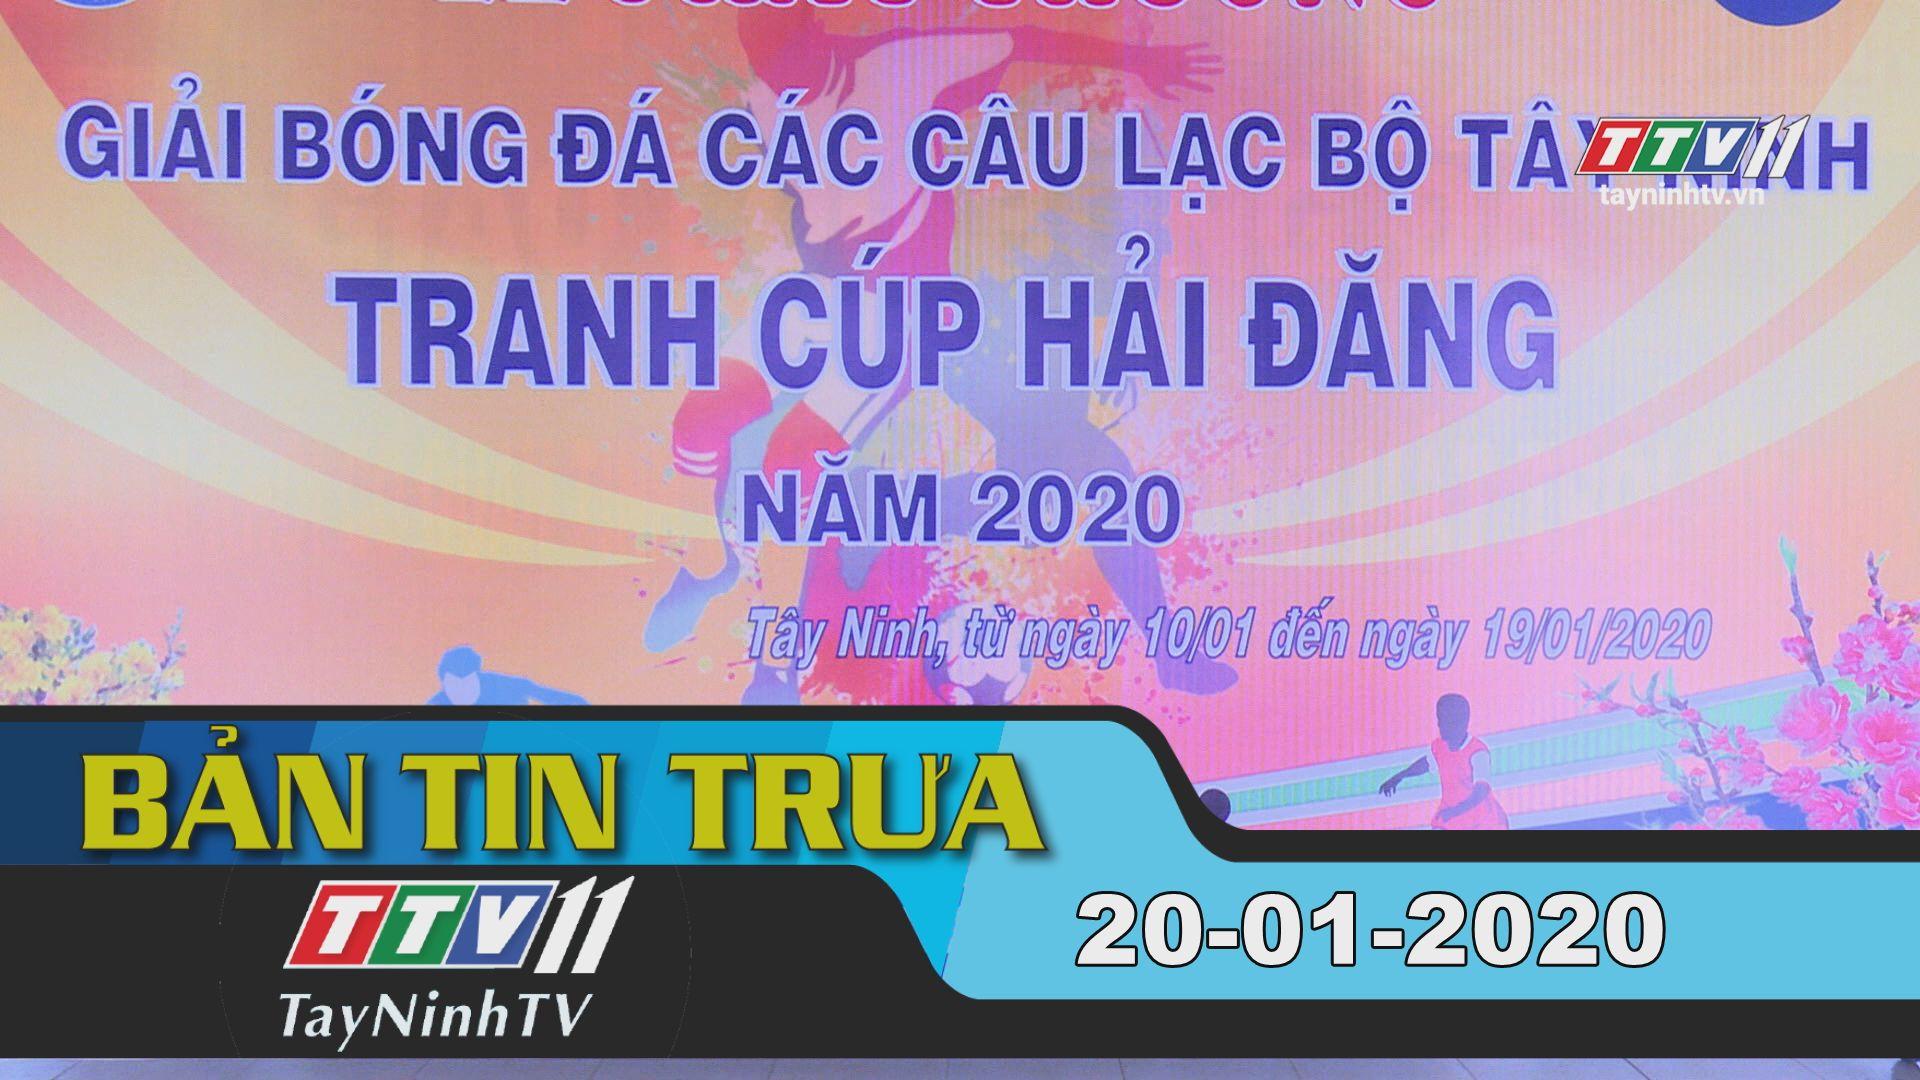 Bản tin trưa 20-01-2020 | Tin tức hôm nay | TayNinhTV